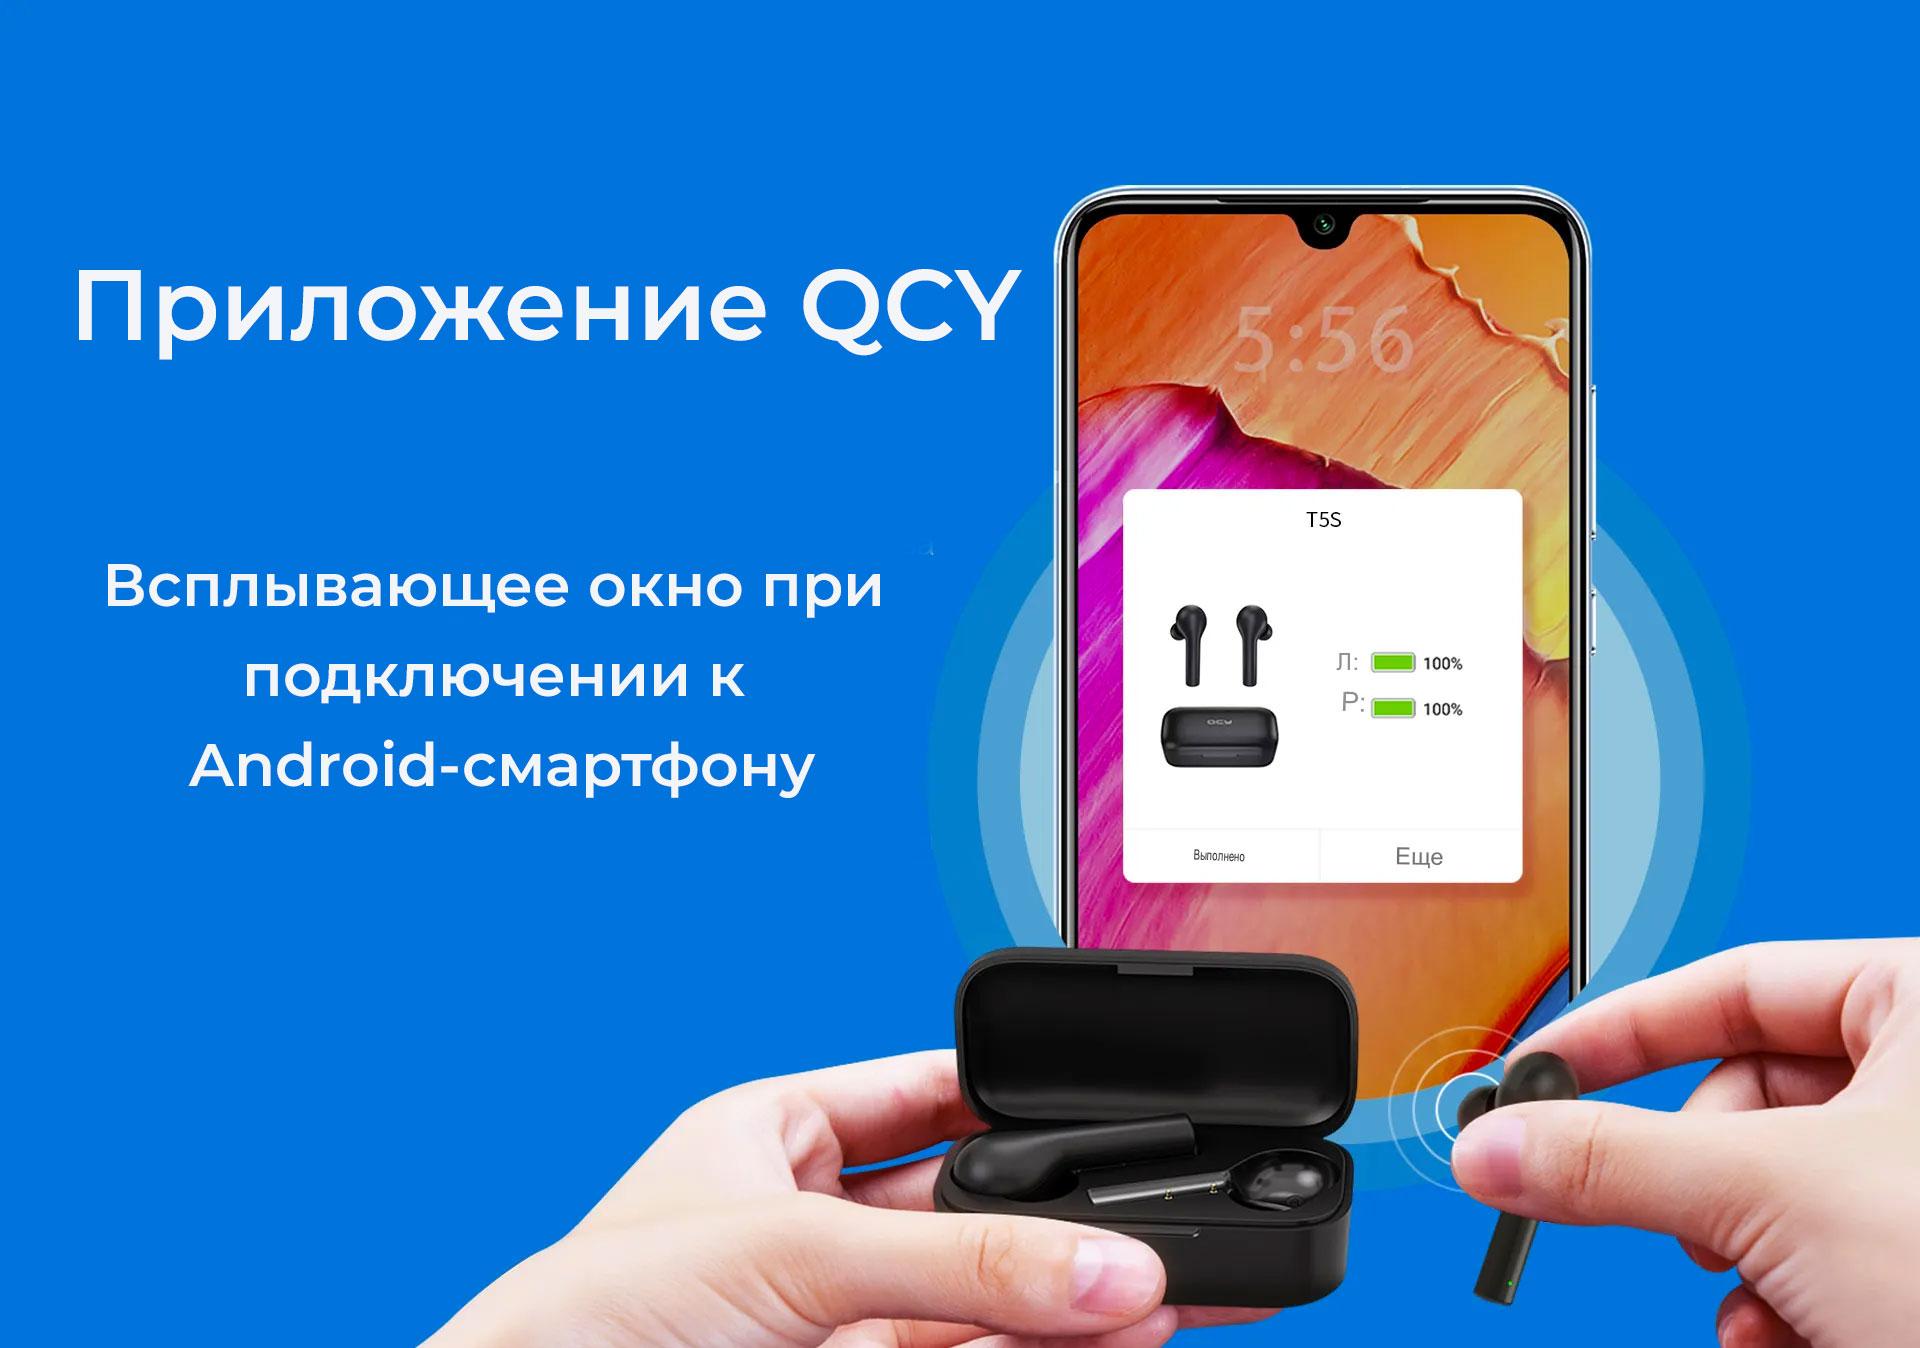 Opisanie Besprovodnye Naushniki Xiaomi Qcy T5s 4